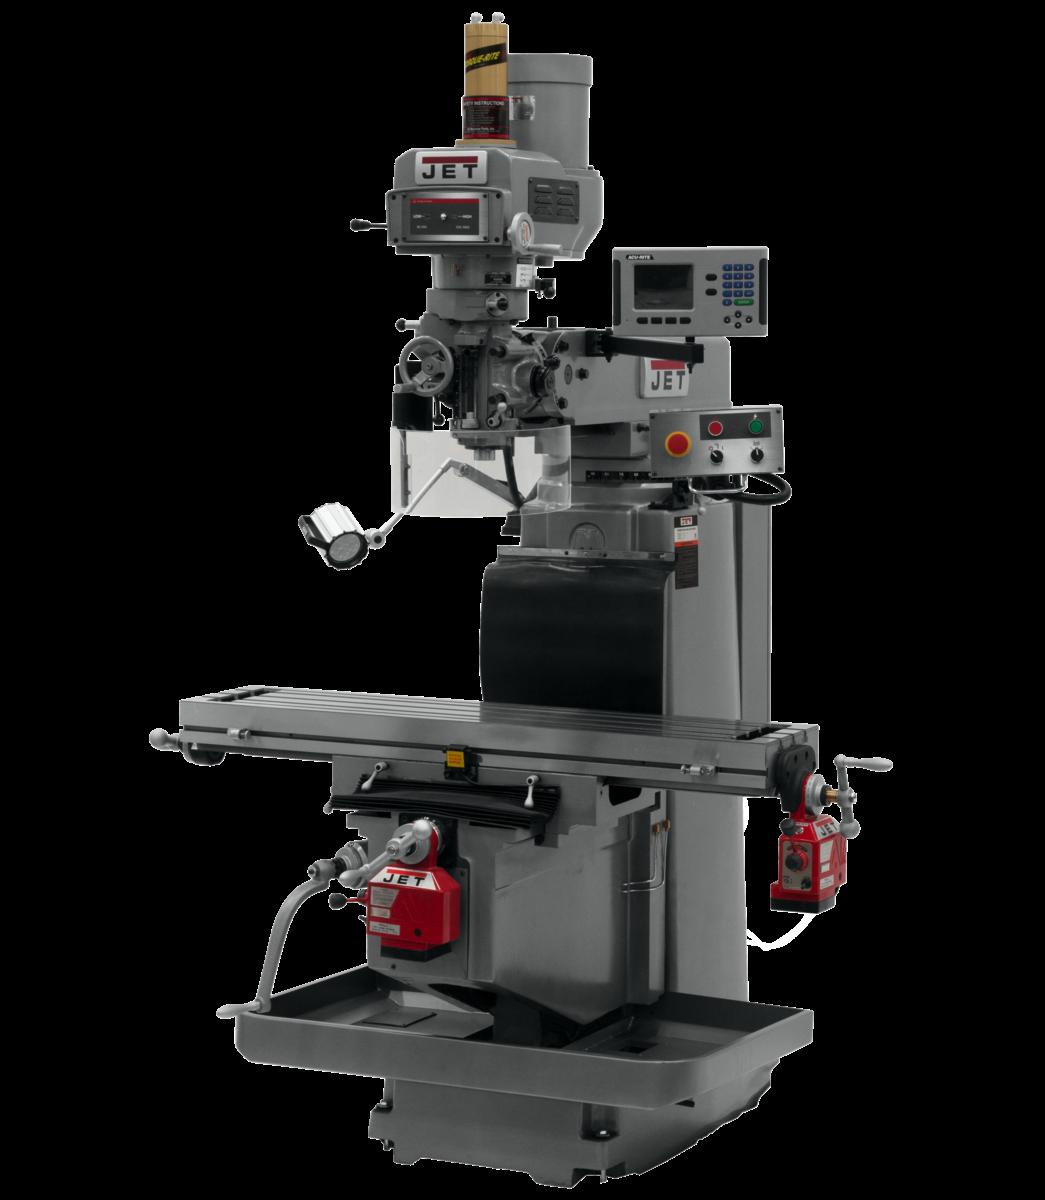 JTM-1254RVS with  ACU-RITE 203 DRO X & Y Powerfeeds & Air Power Drawbar